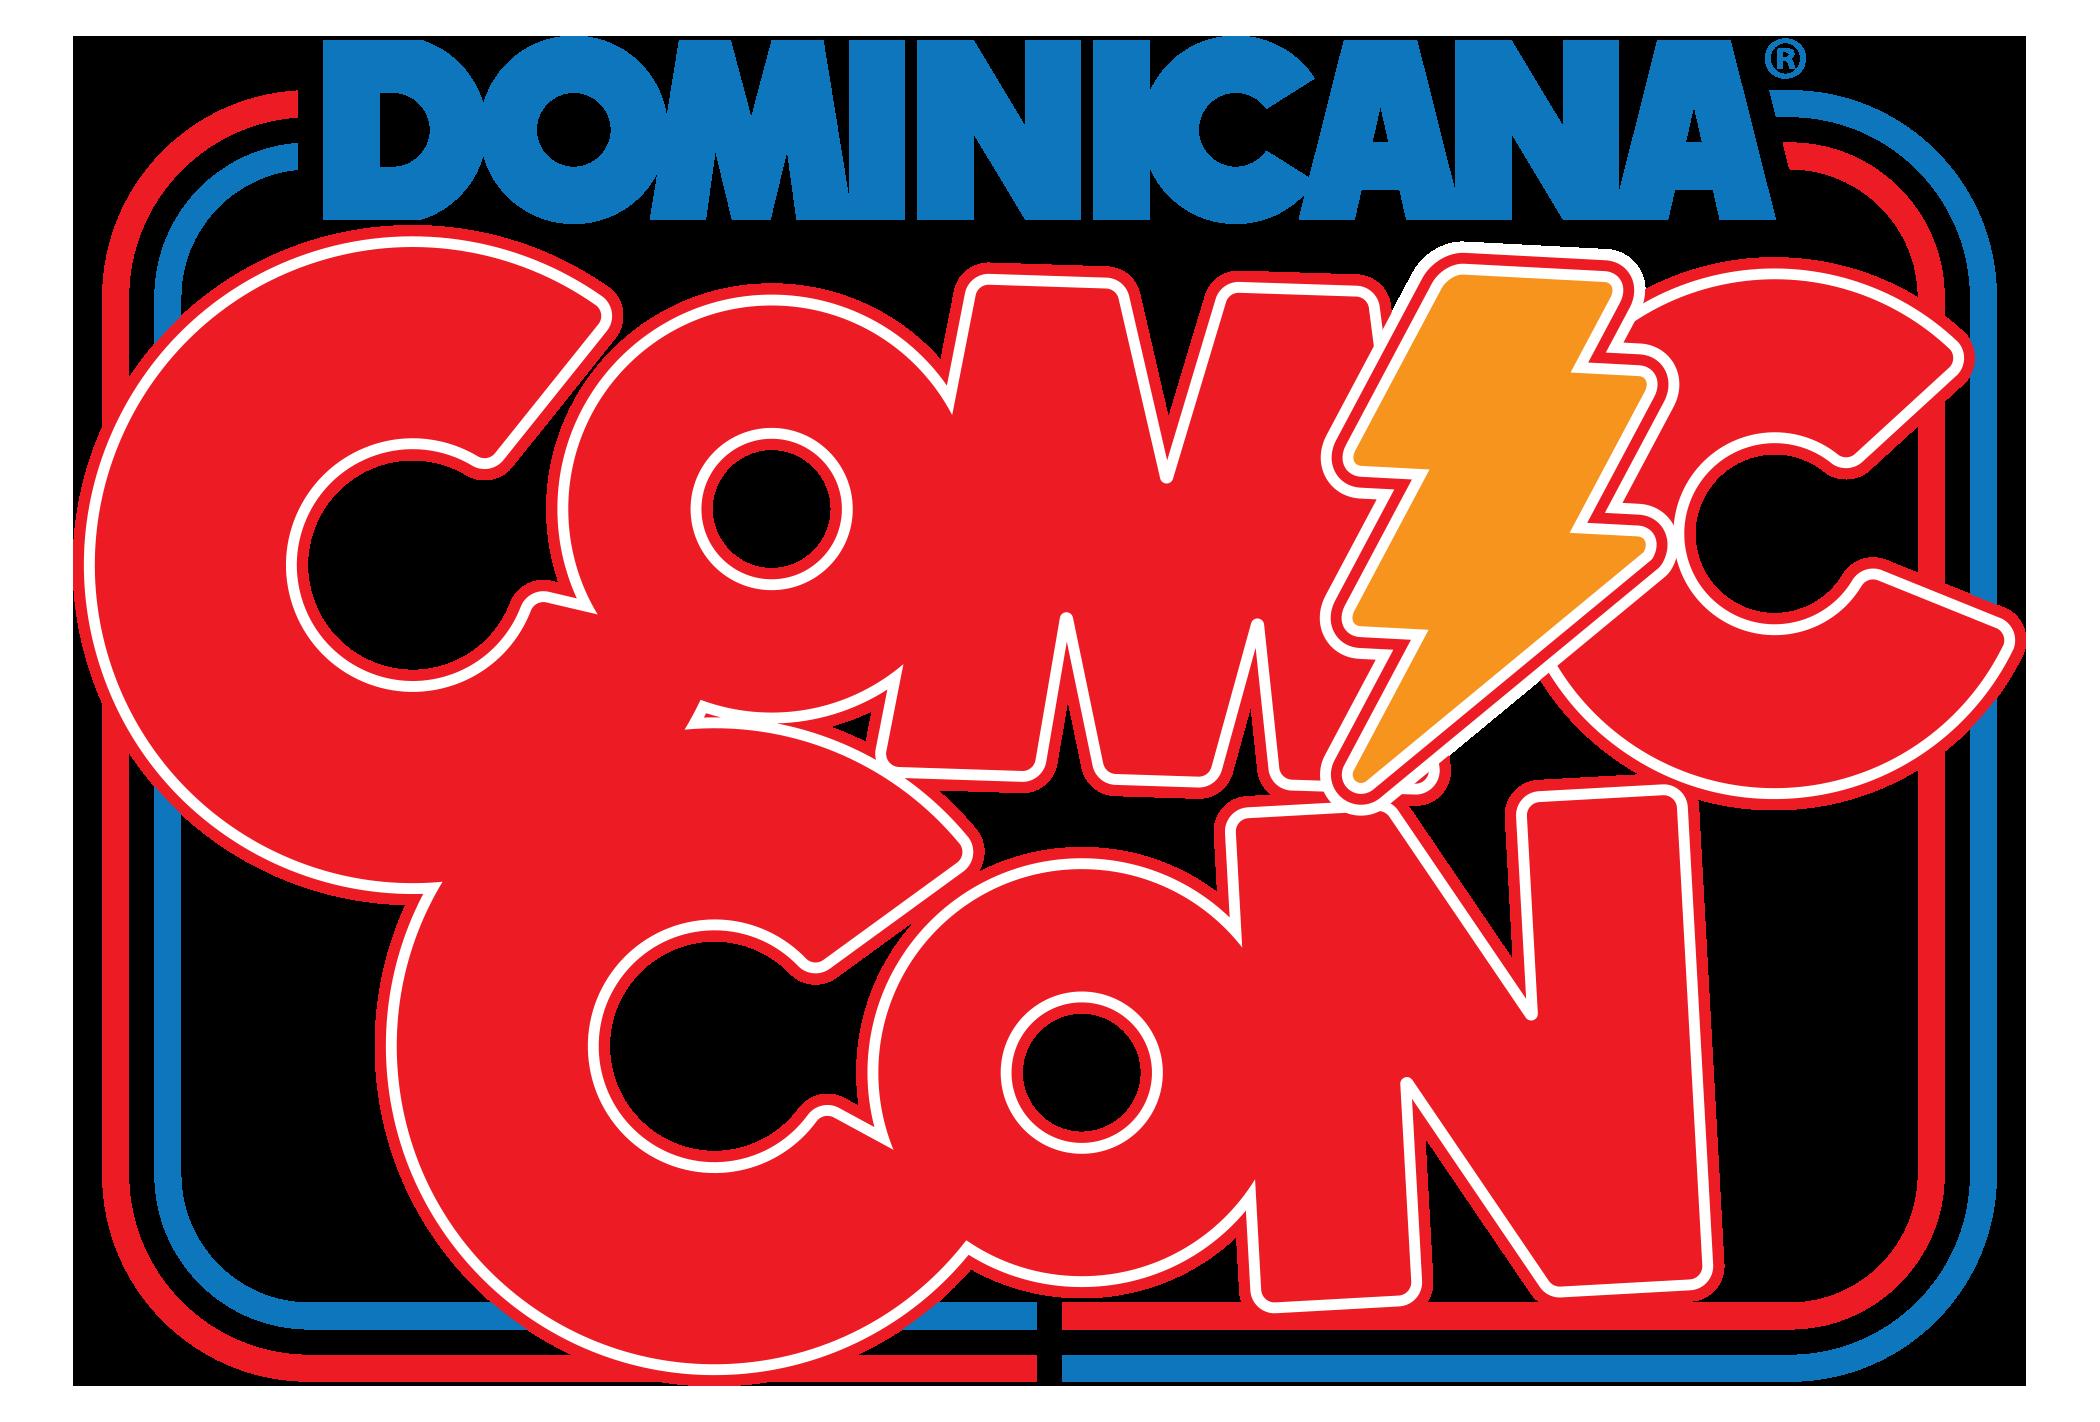 dominicana logo.png